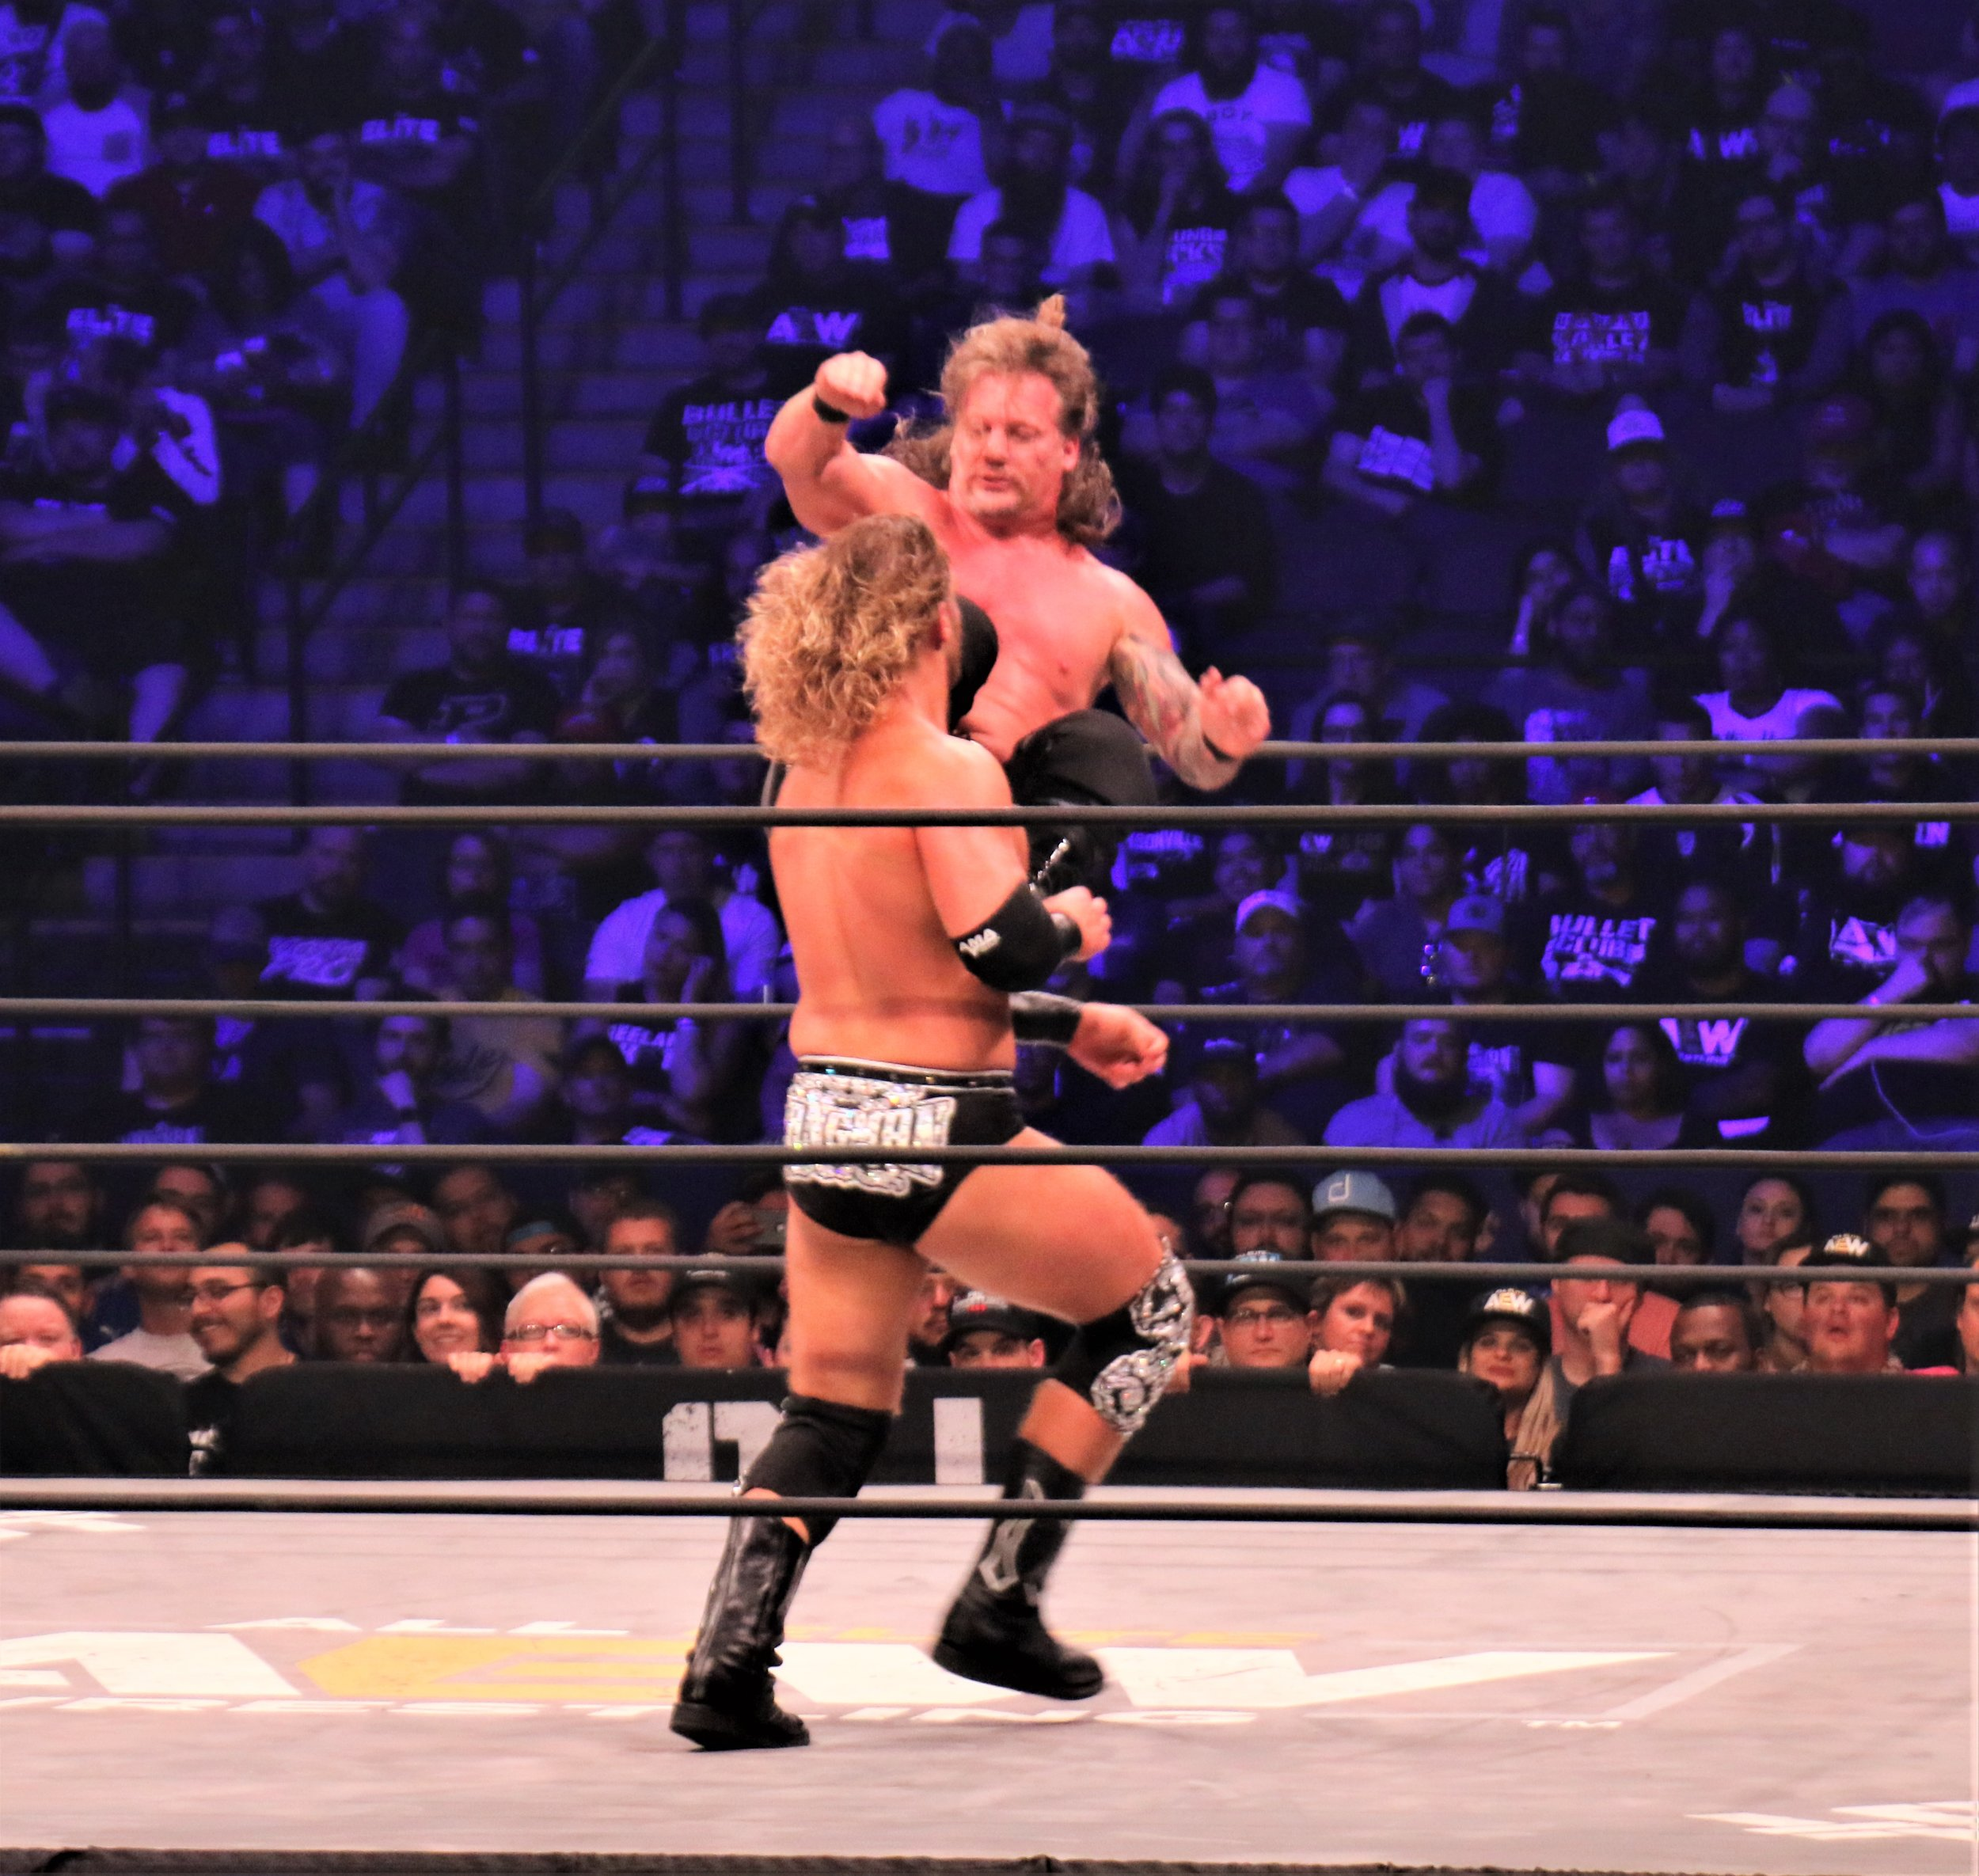 Chris Jericho dropkicks Hangman Page.